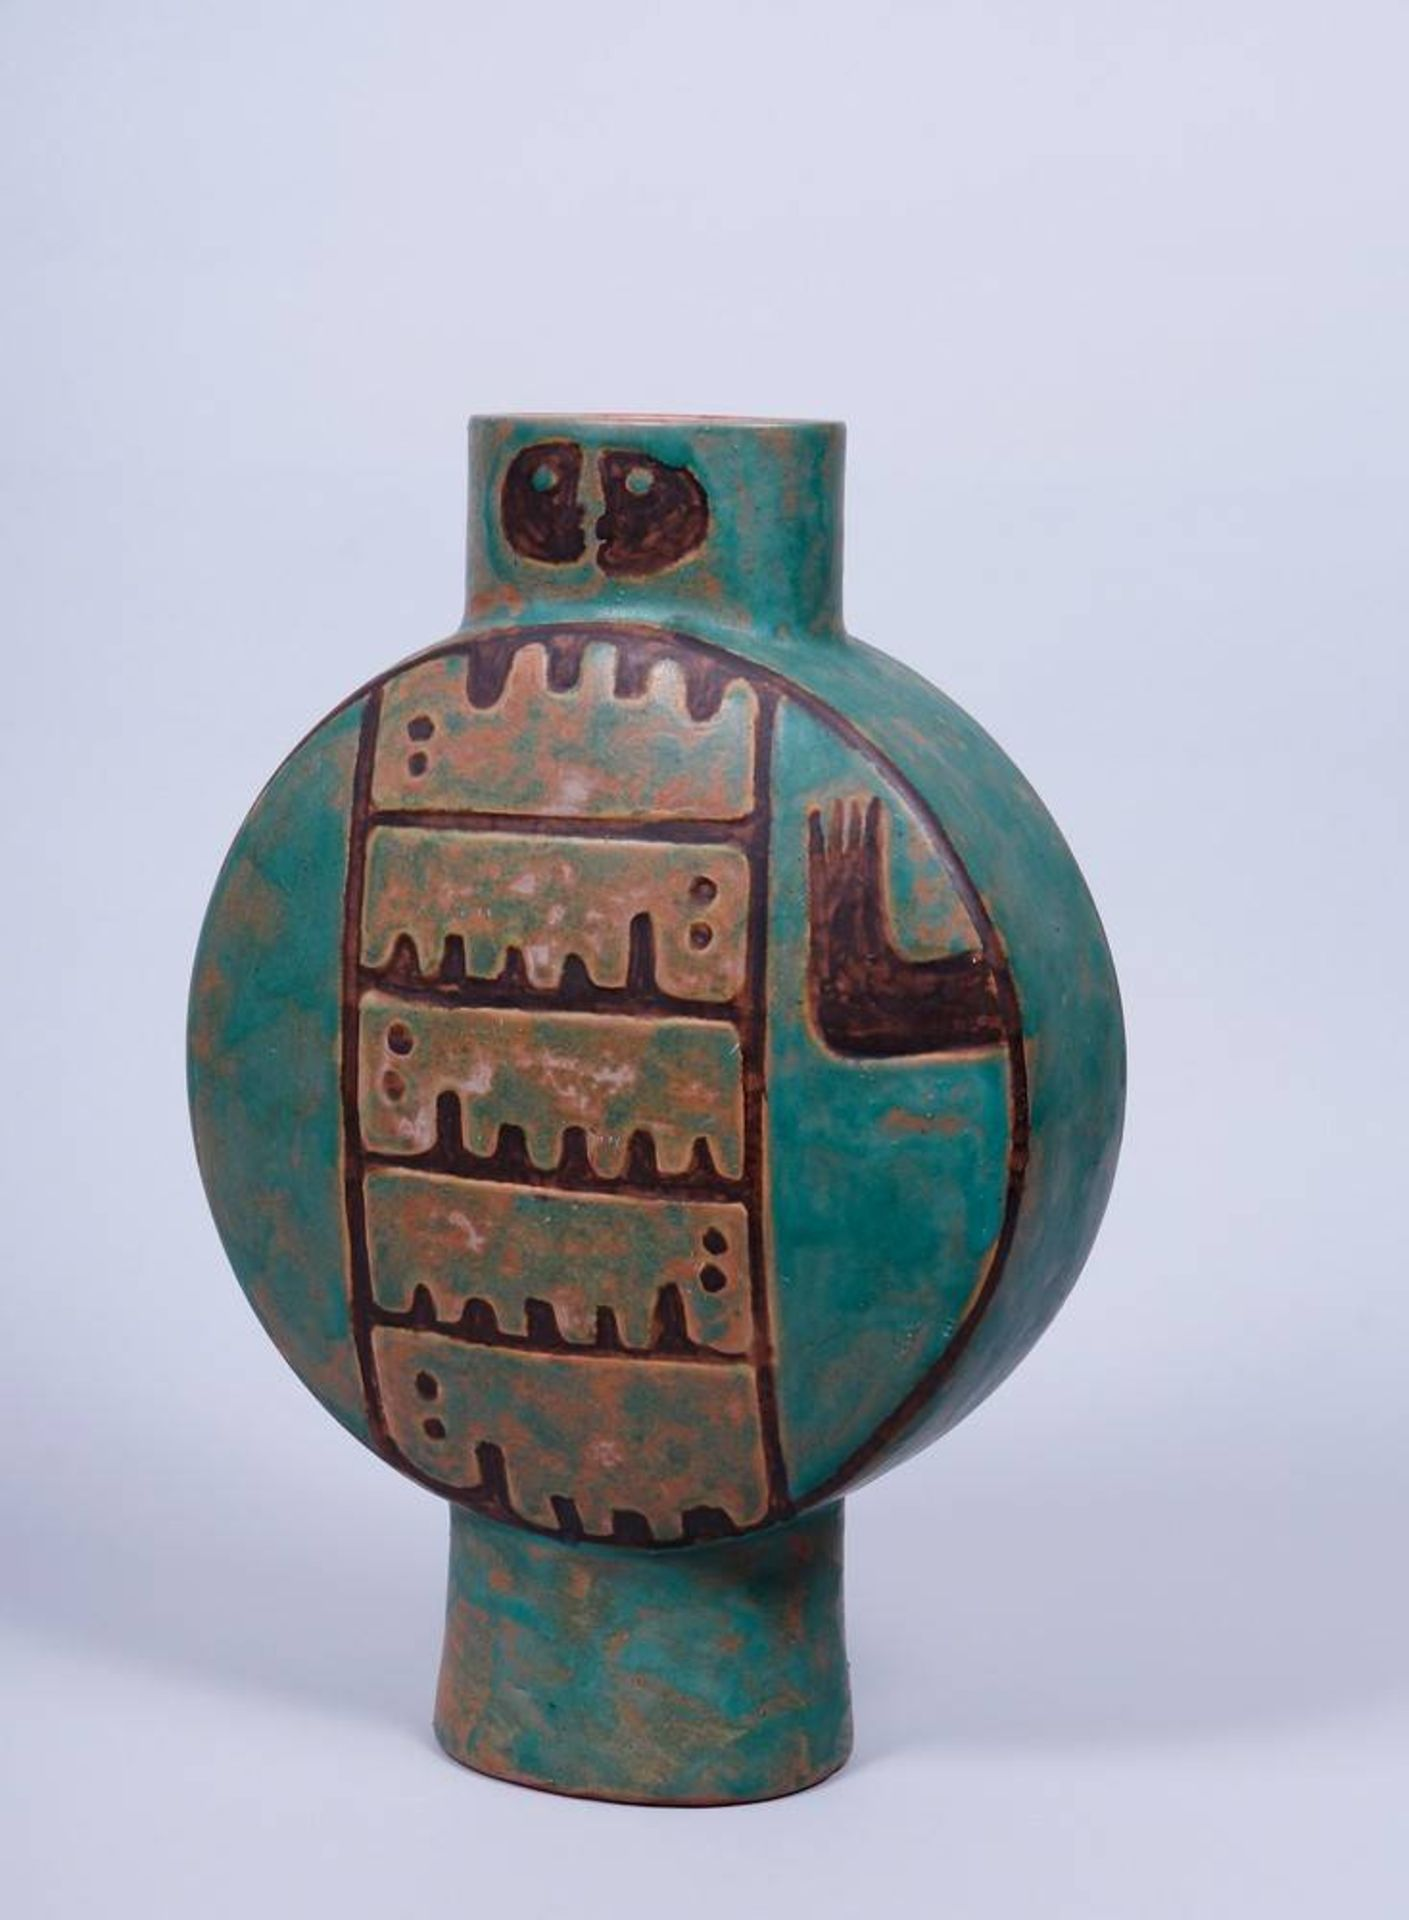 Große Vase, wohl Eva Fritz-Lindner, 20.Jh. auf ovalem Standring, runder Korpus mit - Bild 2 aus 4